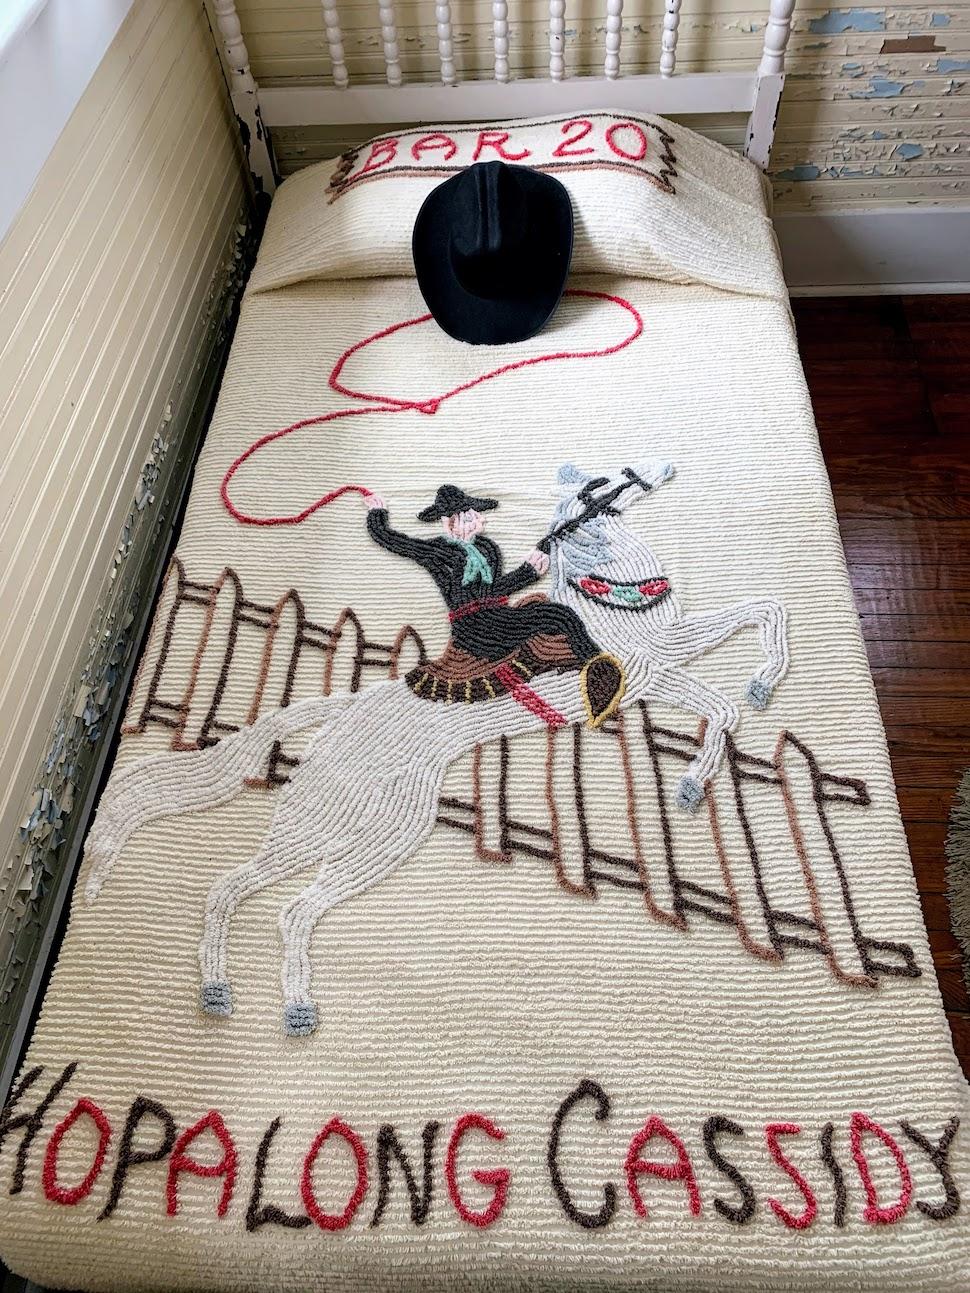 Hopalong Cassidy Bedspread